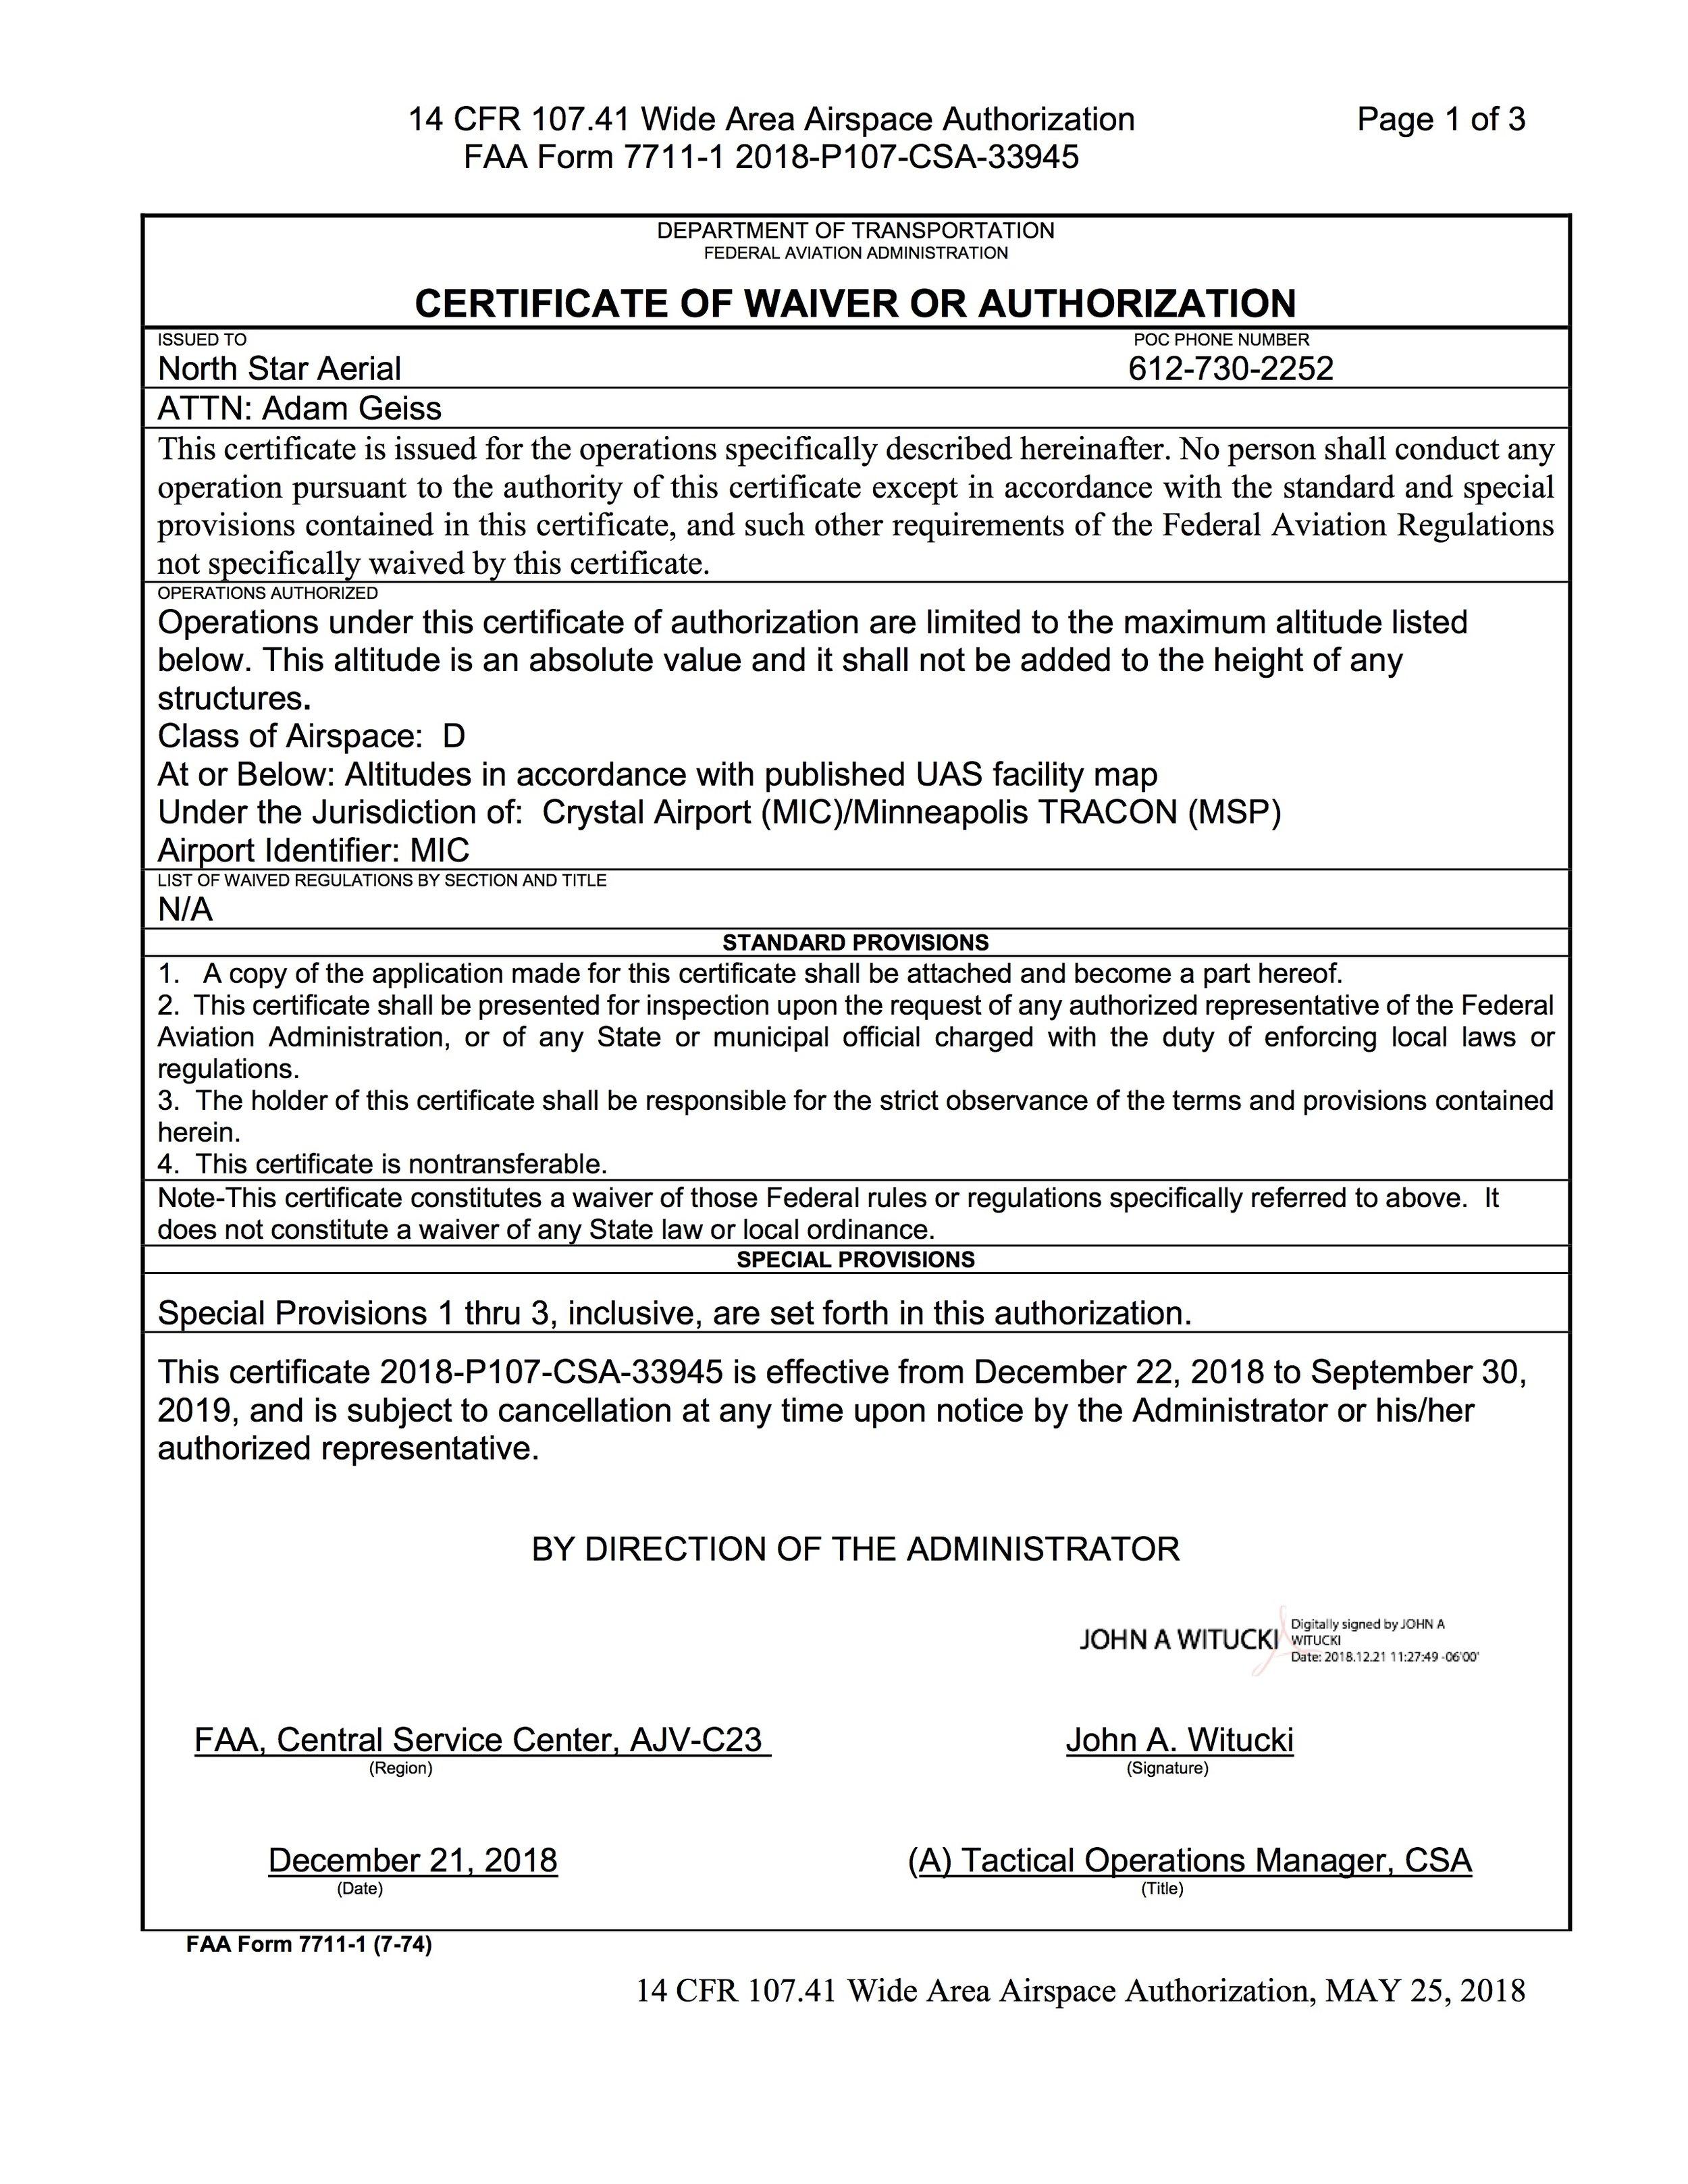 FAA Form 7711-1 2018-P107-CSA-33945 MIC.jpg